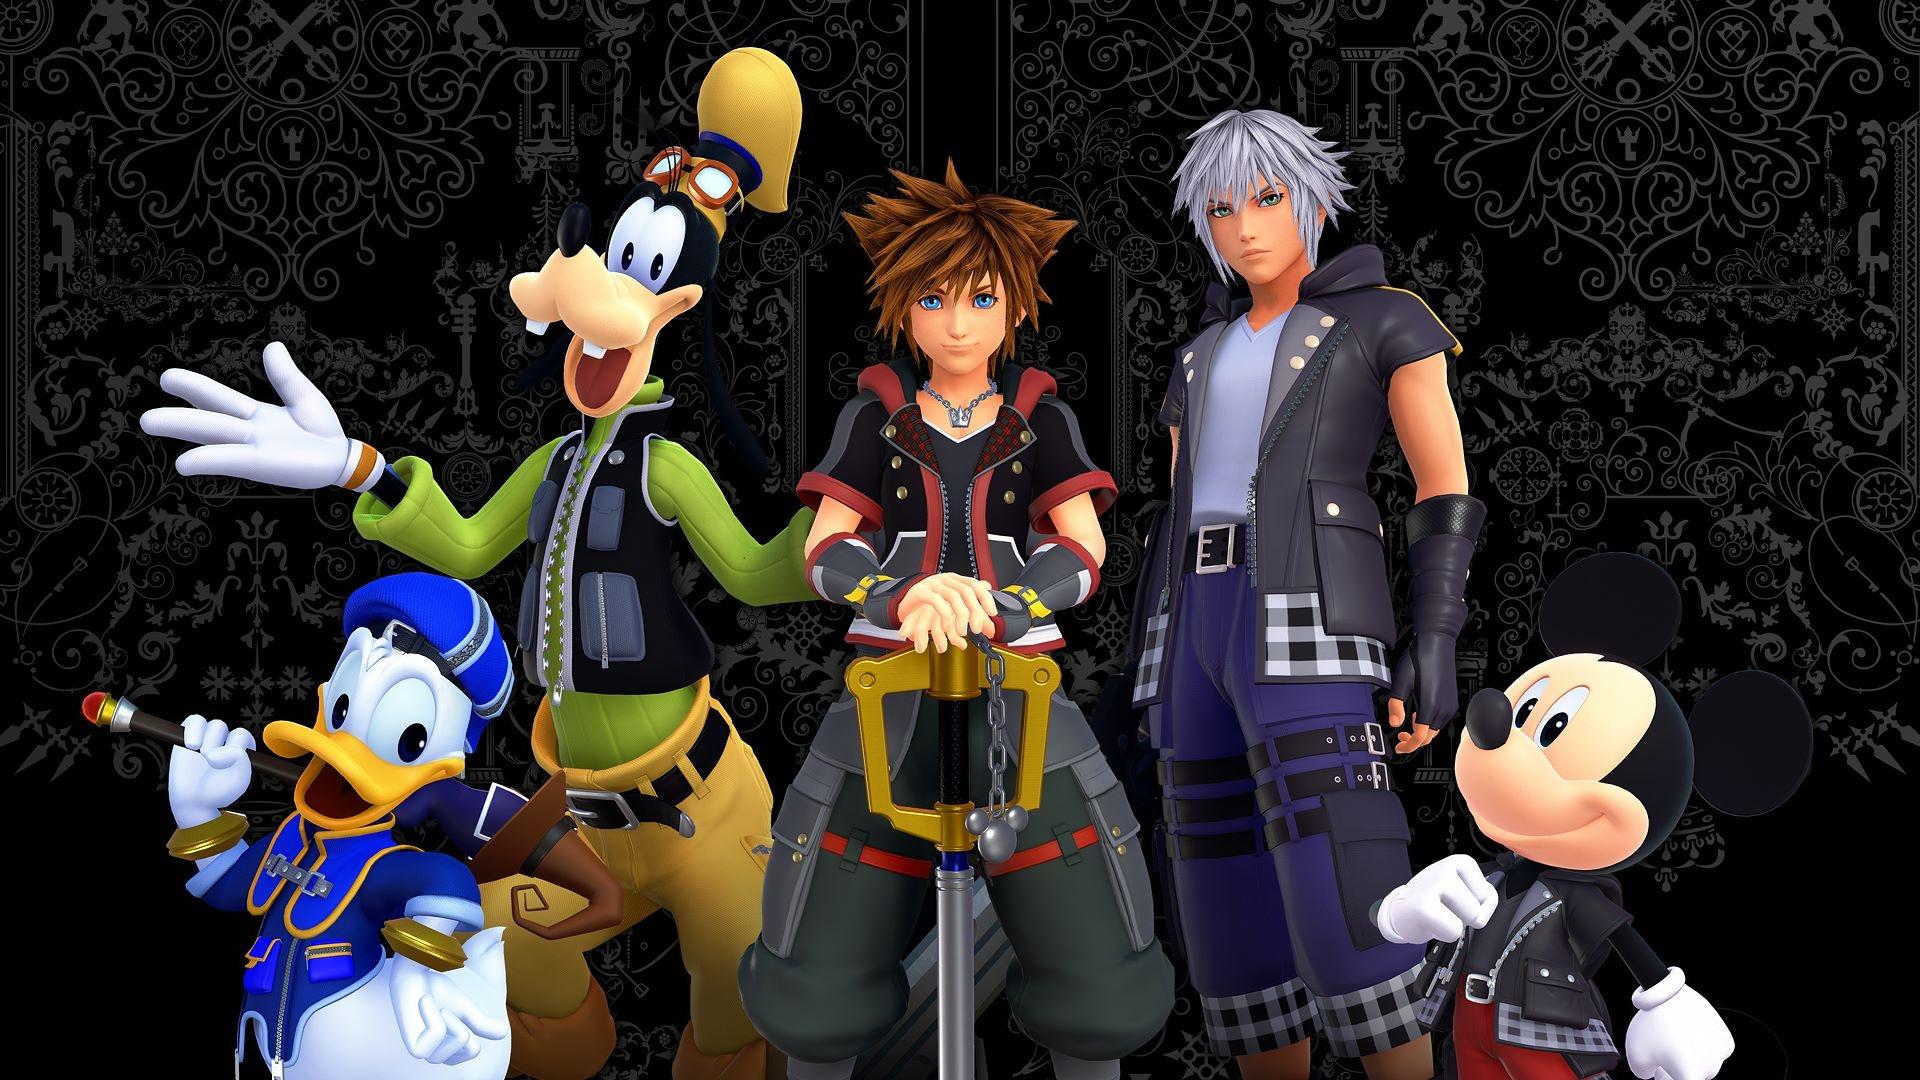 Square Enix, Блоги, Disney, Kingdom Hearts 3, Sony PlayStation